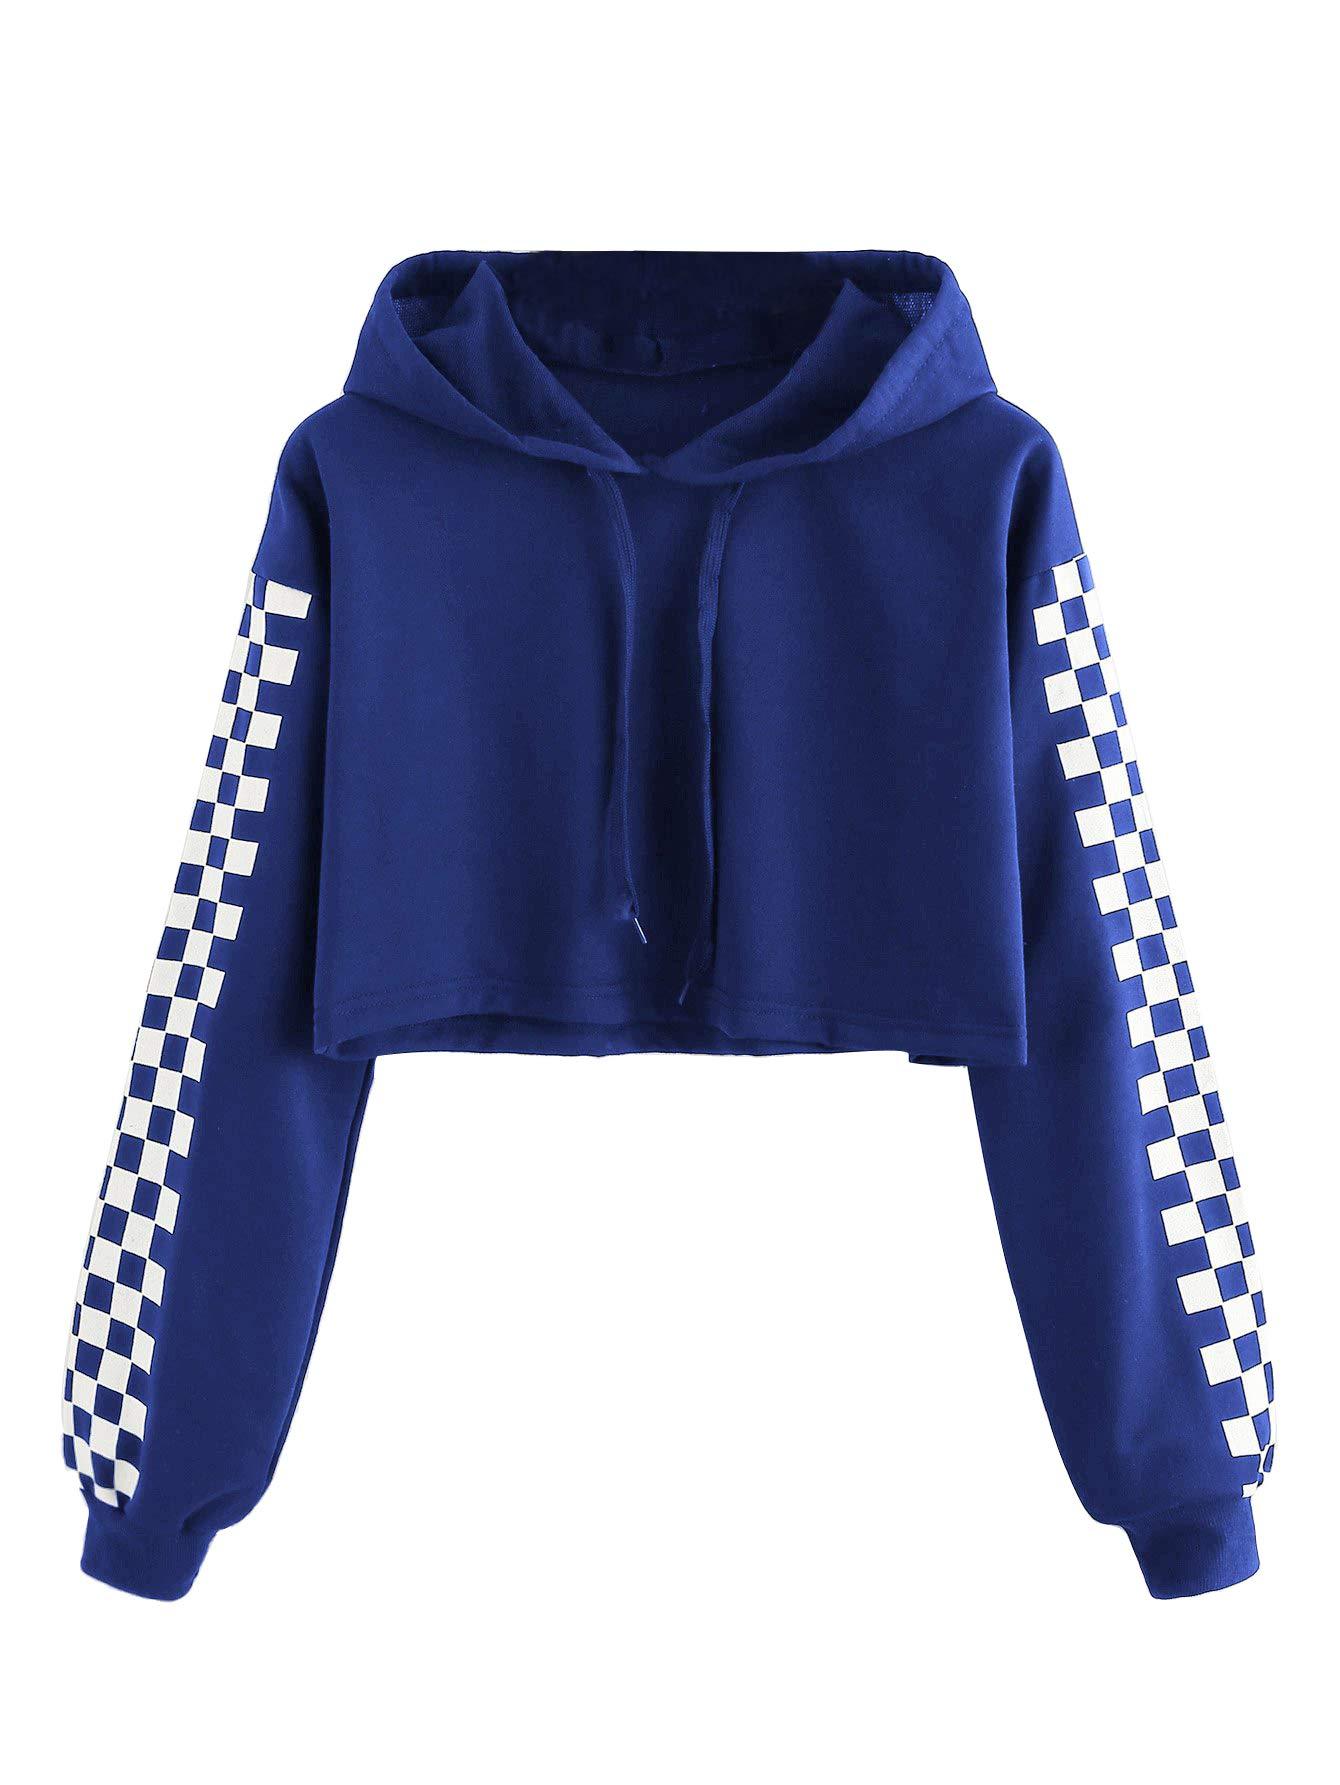 MakeMeChic Women's Pineapple Embroidered Hoodie Plaid Crop Top Sweatshirt Royal Blue L